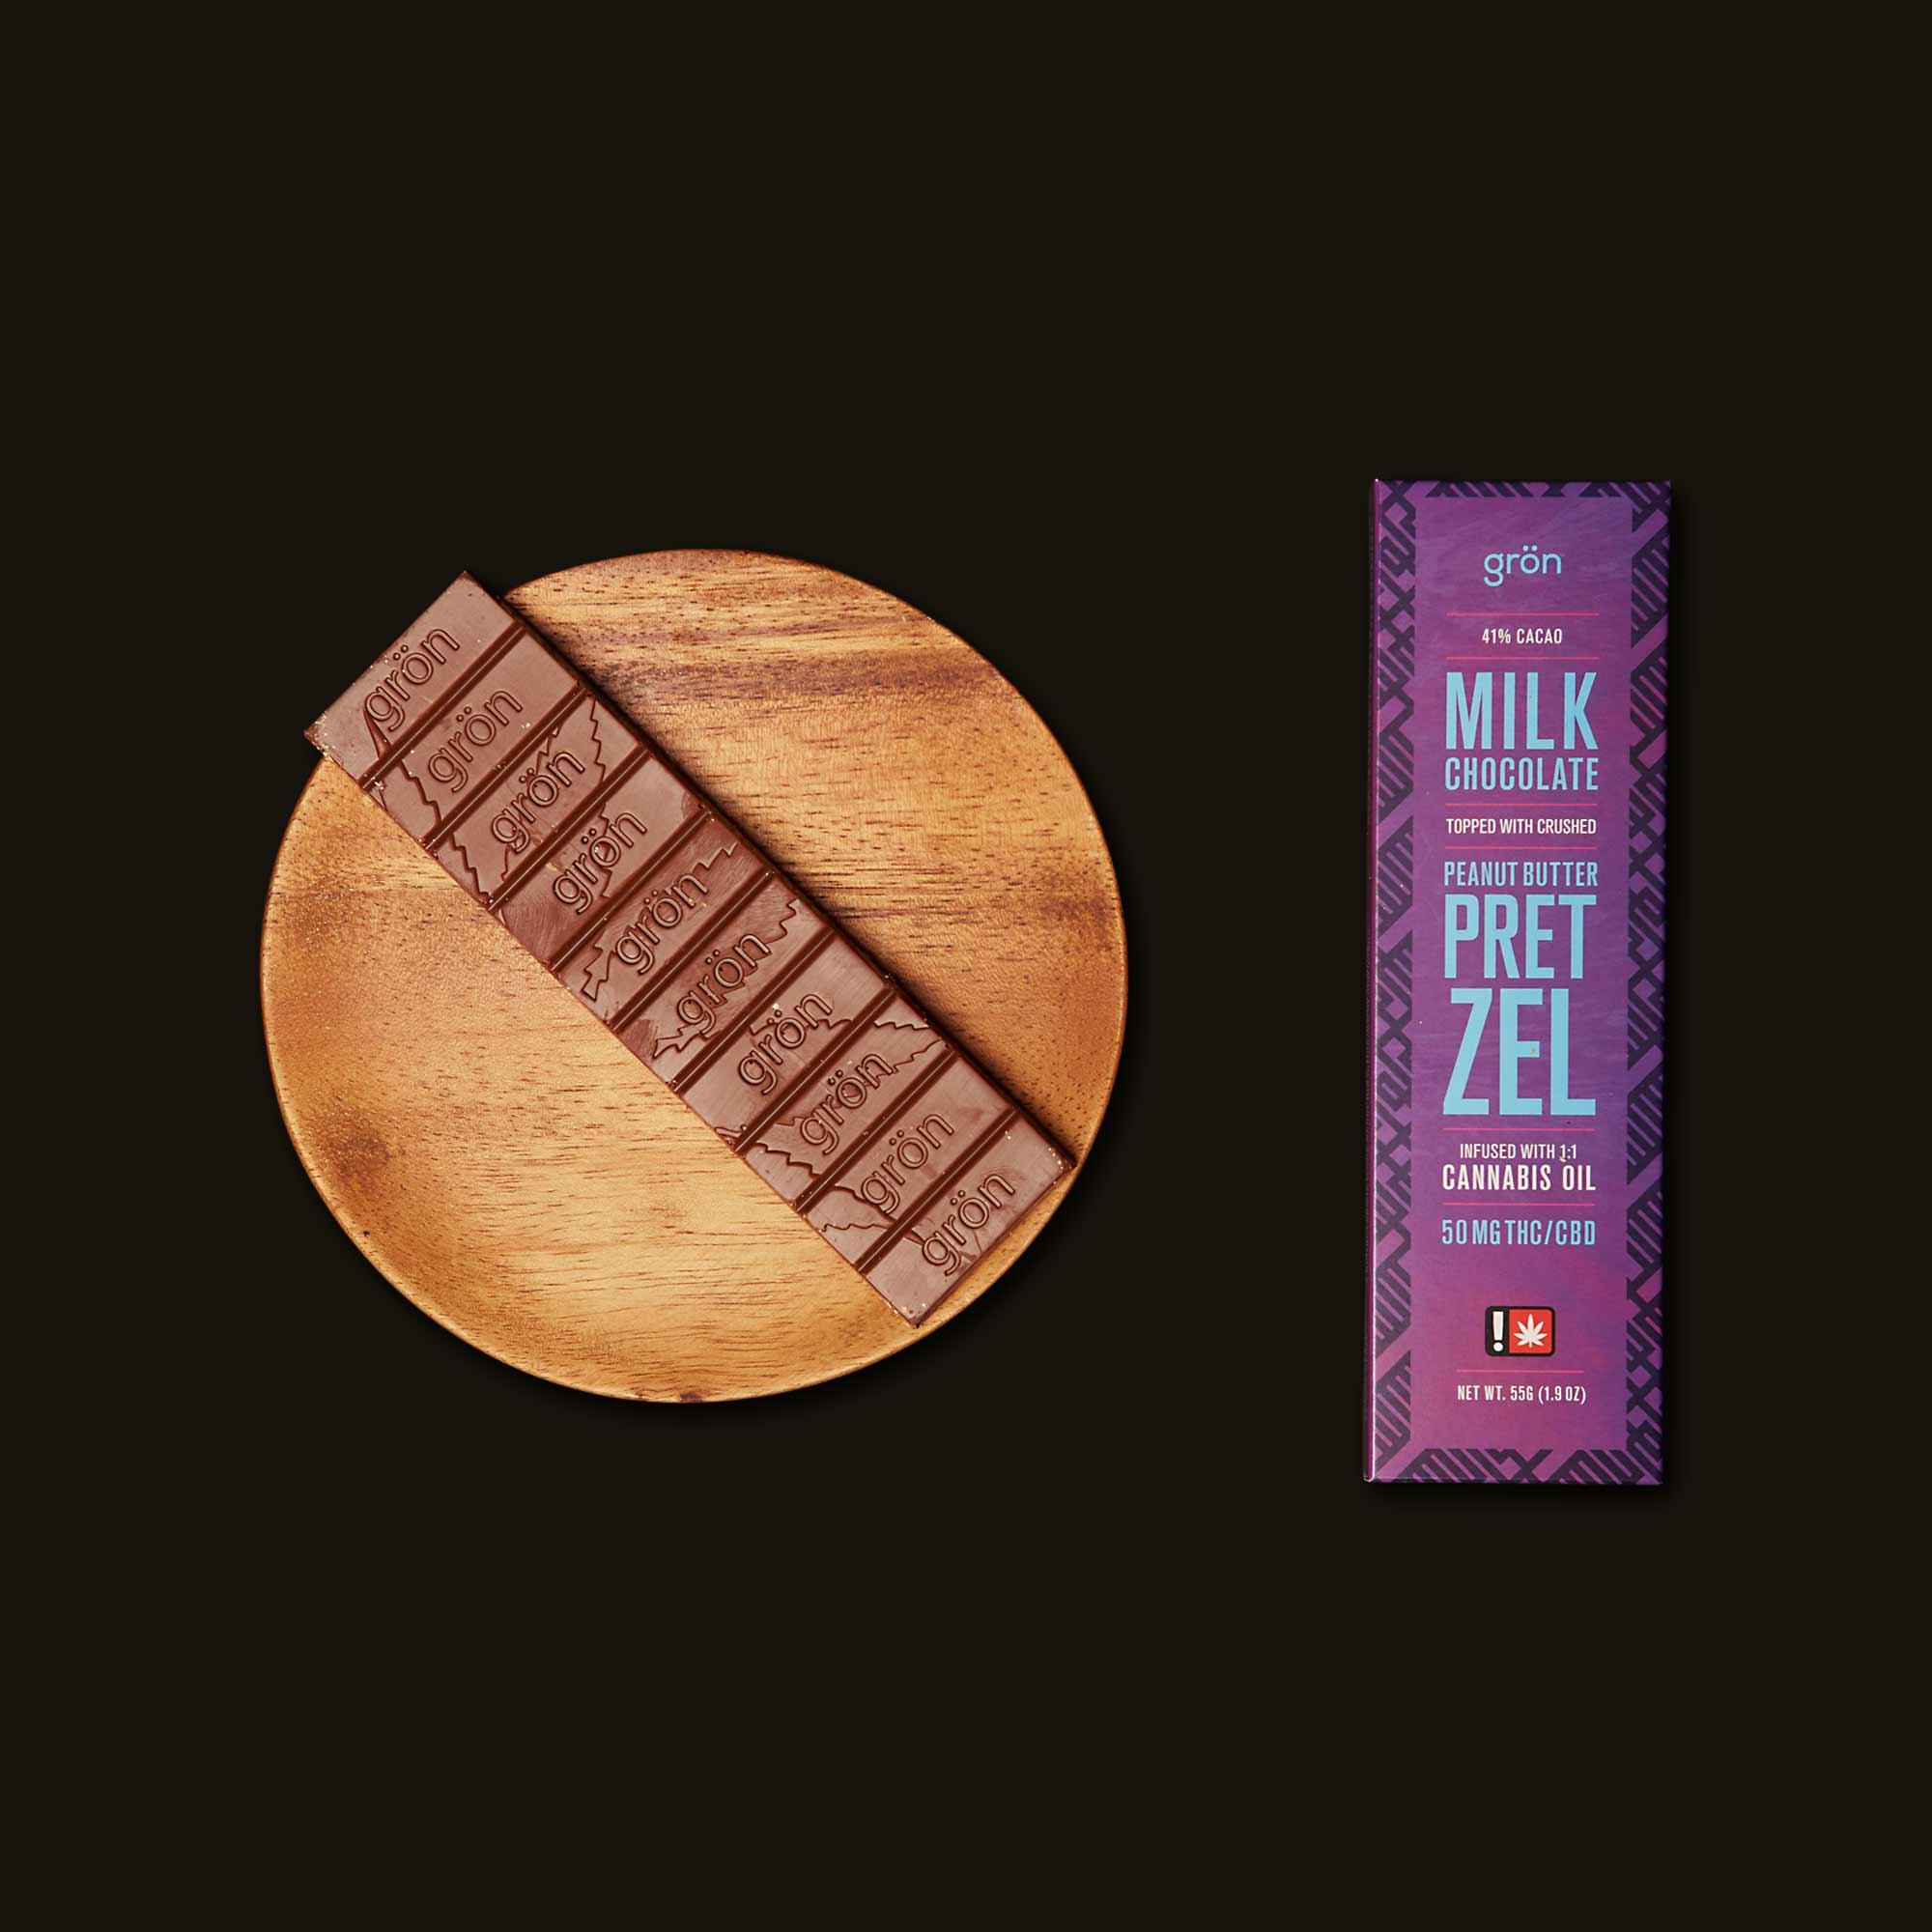 Grön Milk Chocolate Peanut Butter Pretzel Bar 1:1